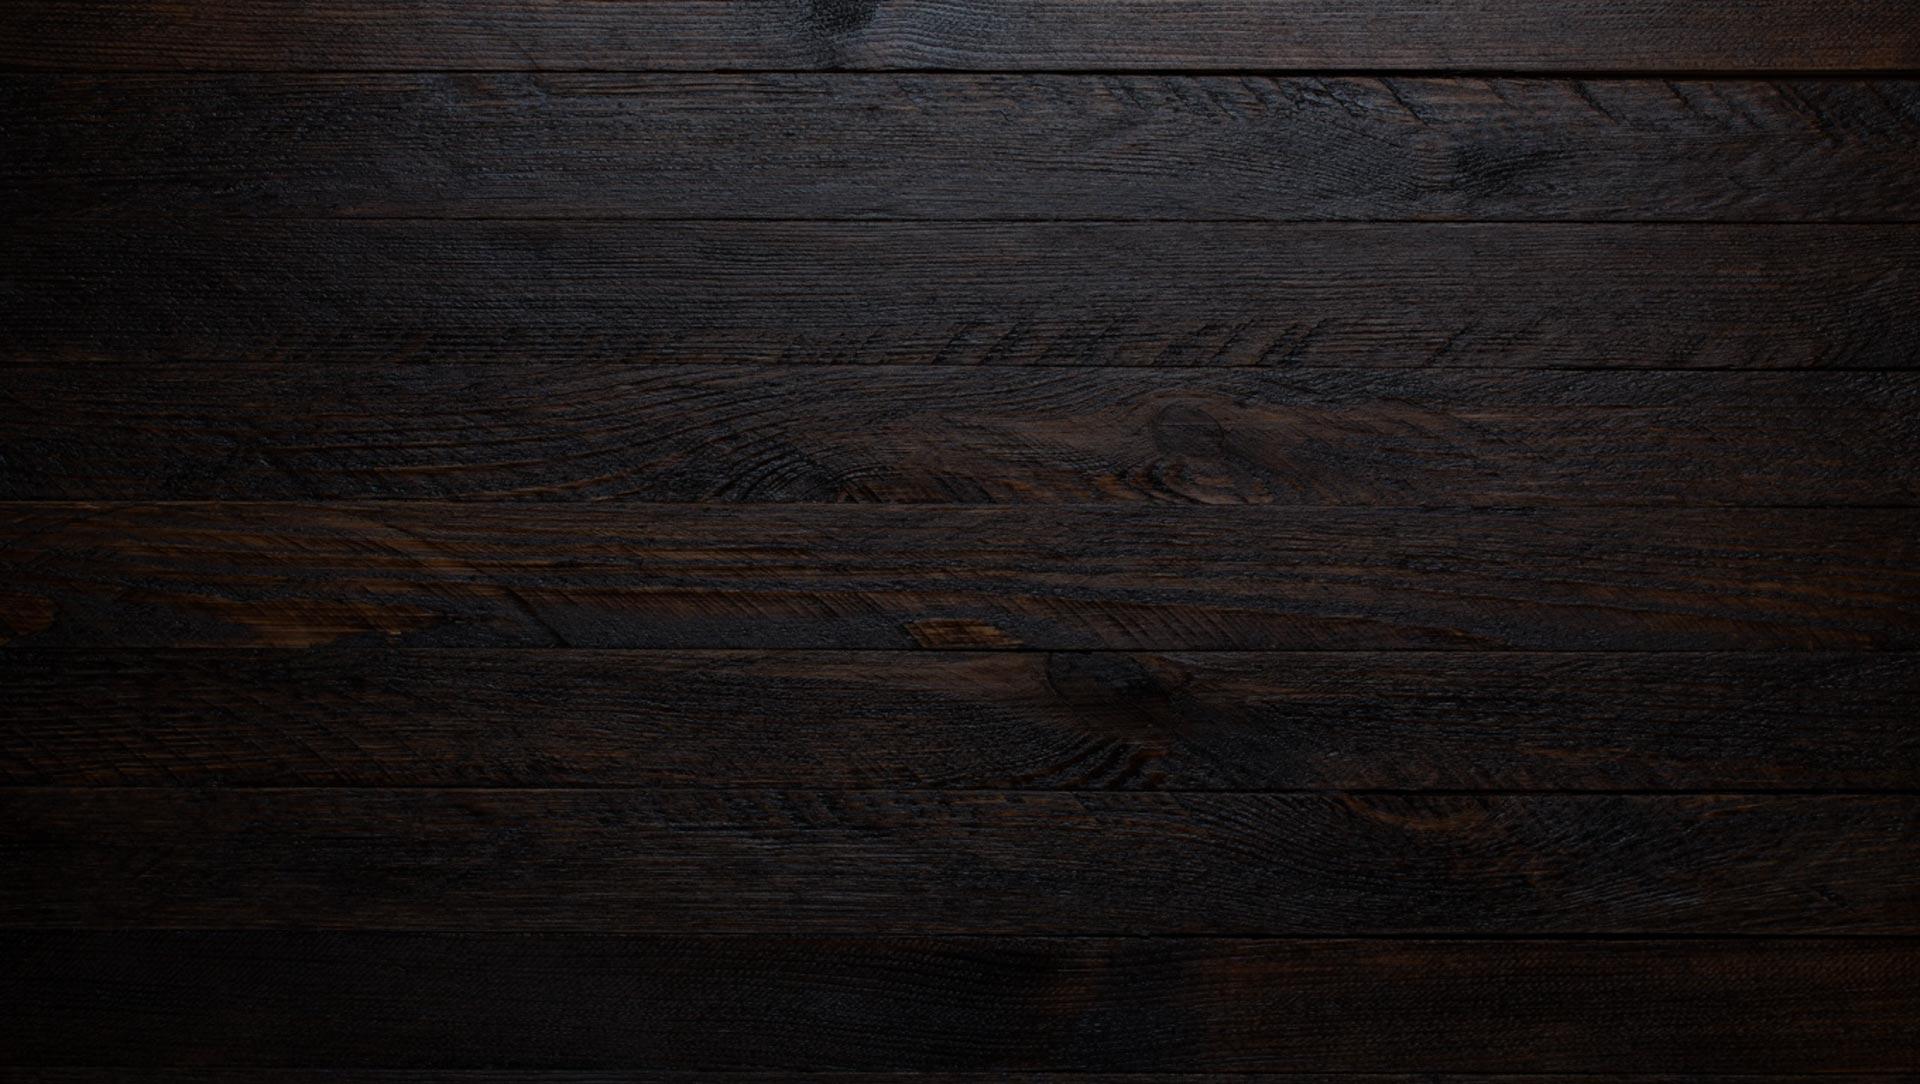 background-horizontal-dark-wood ⋆ Baazar Productions